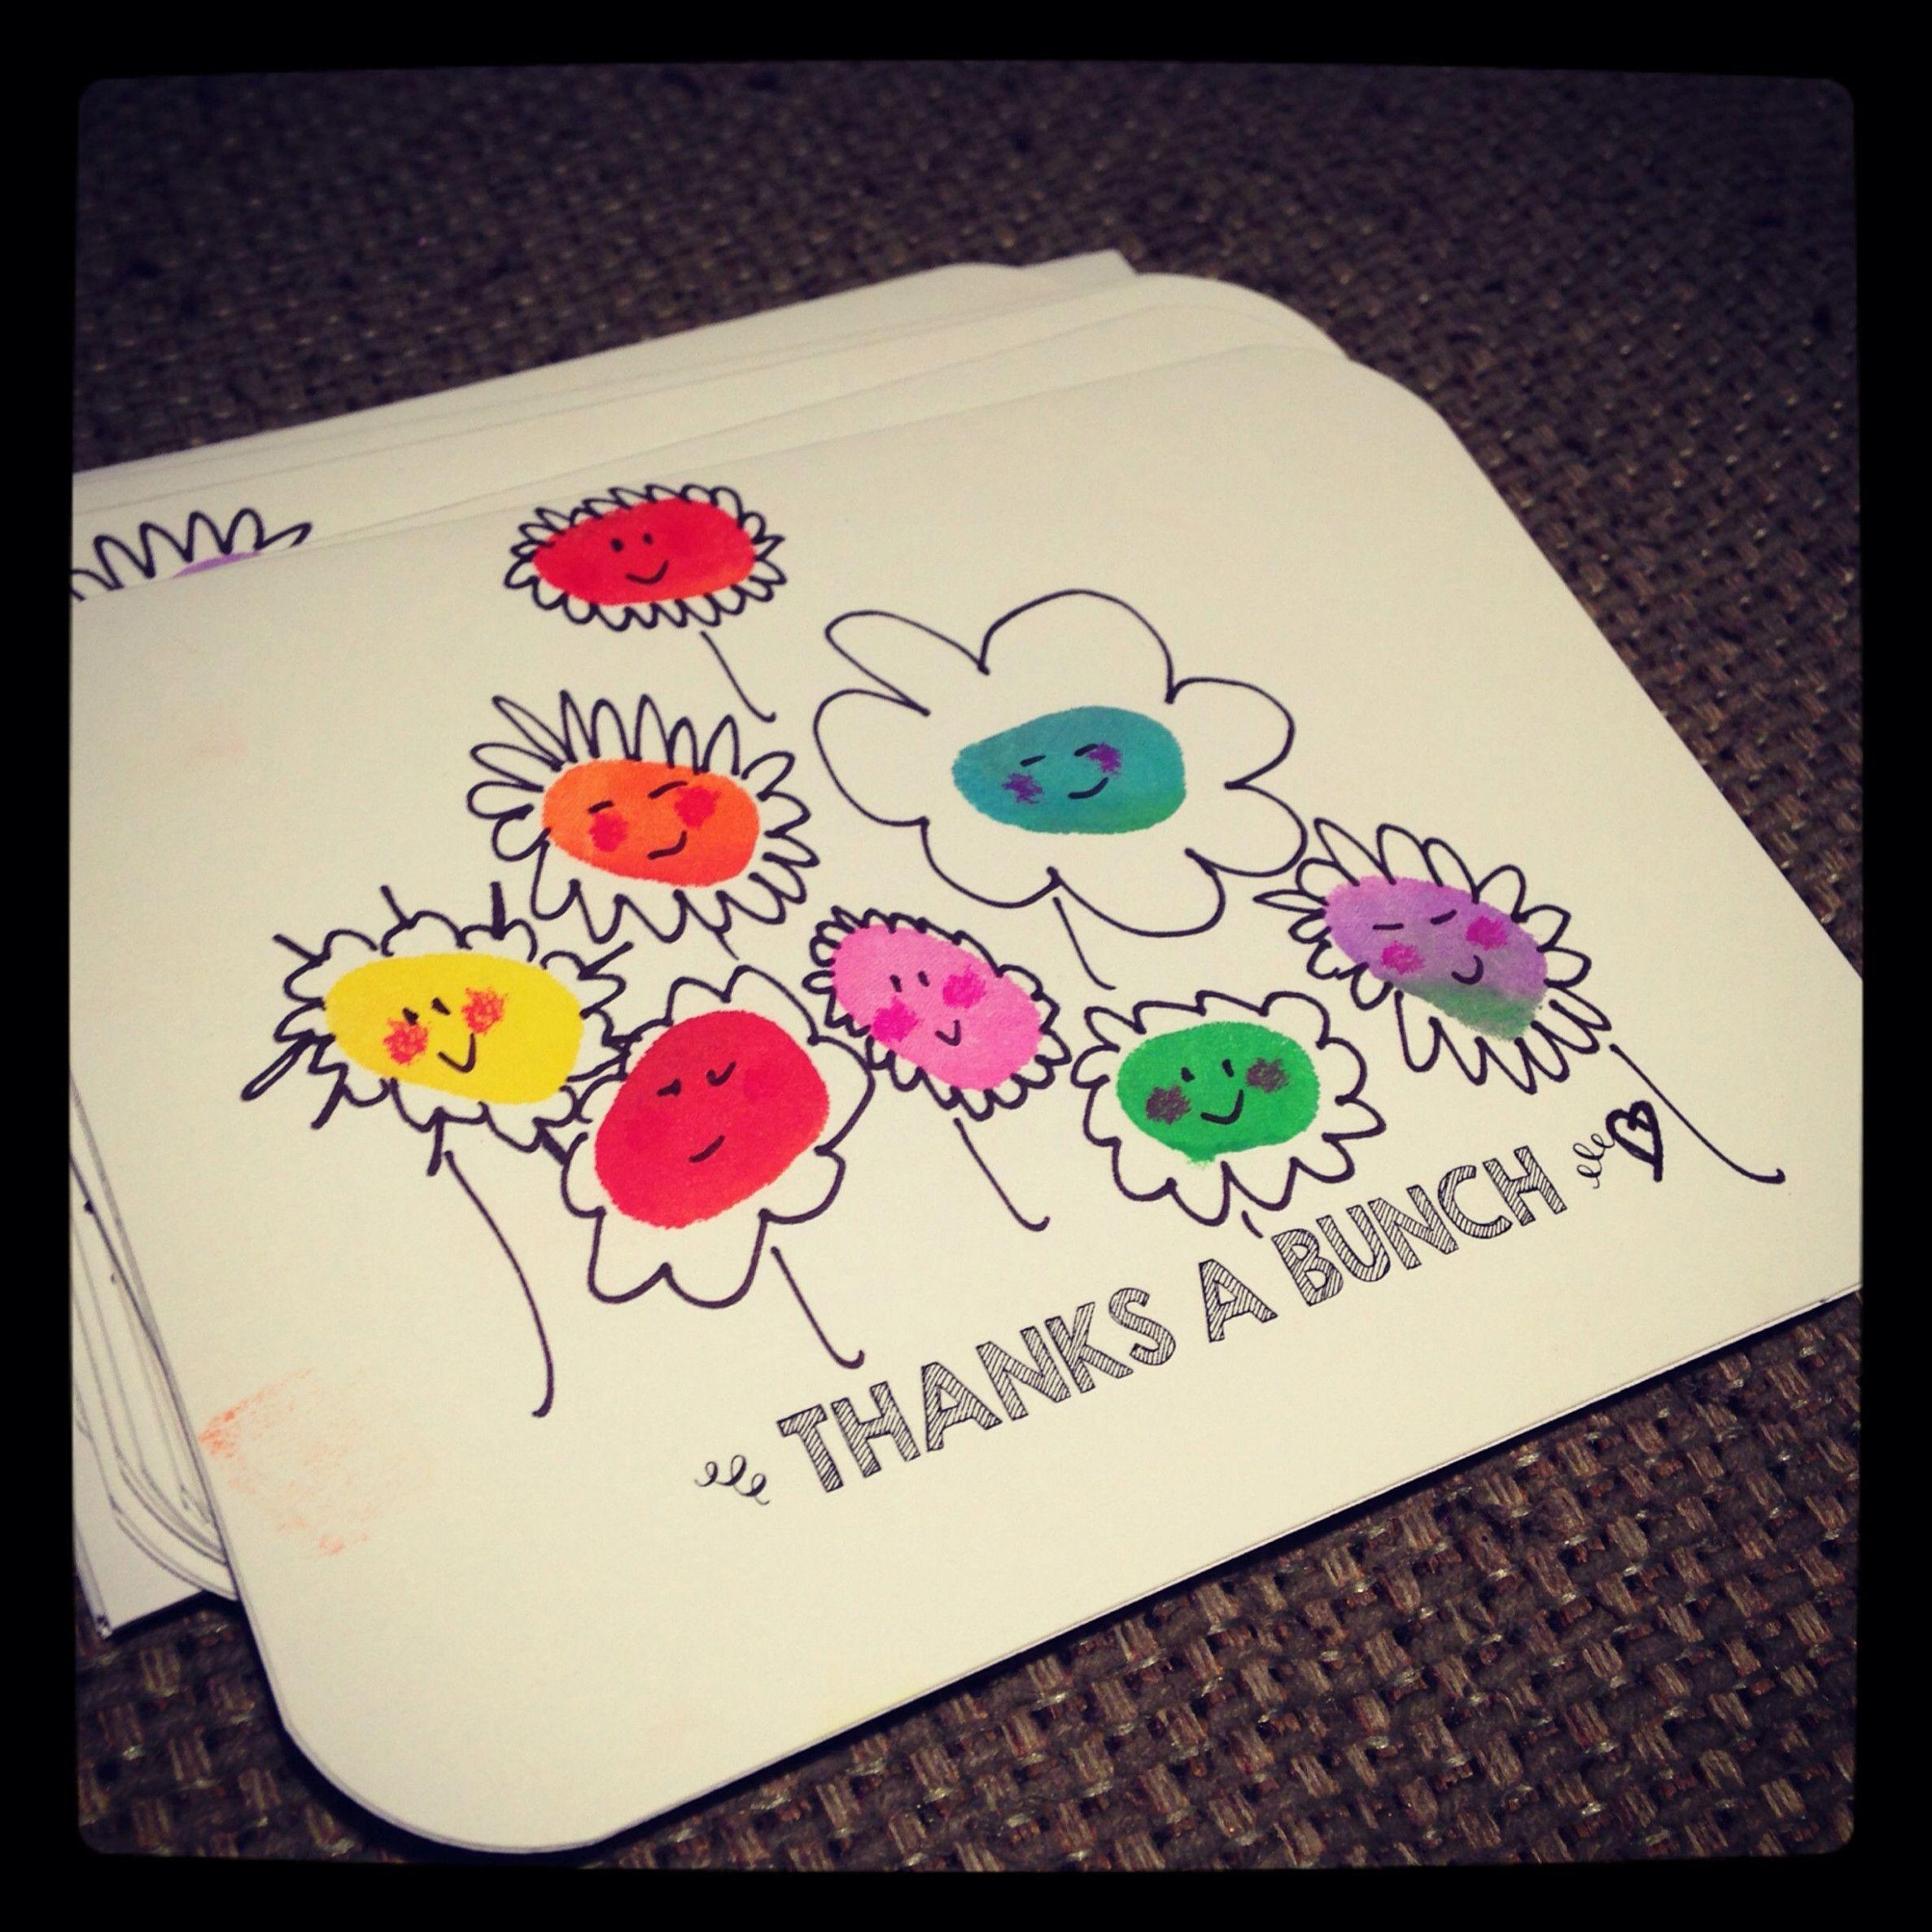 Farewell Card For Nursery Teacher Teacher Thank You Cards Handmade Thank You Cards Thank You Cards From Kids